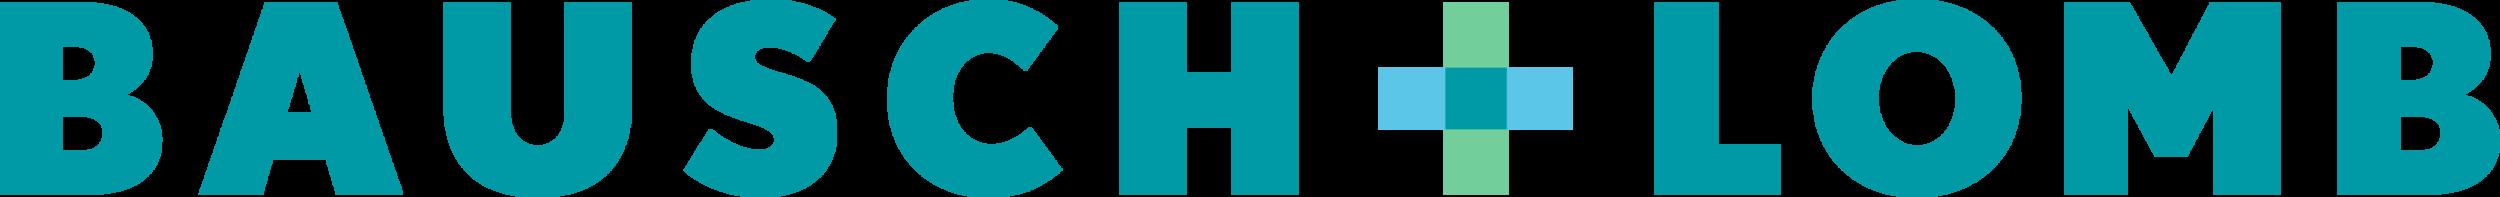 Bausch-Lomb-logo-rgb-no-tag.png